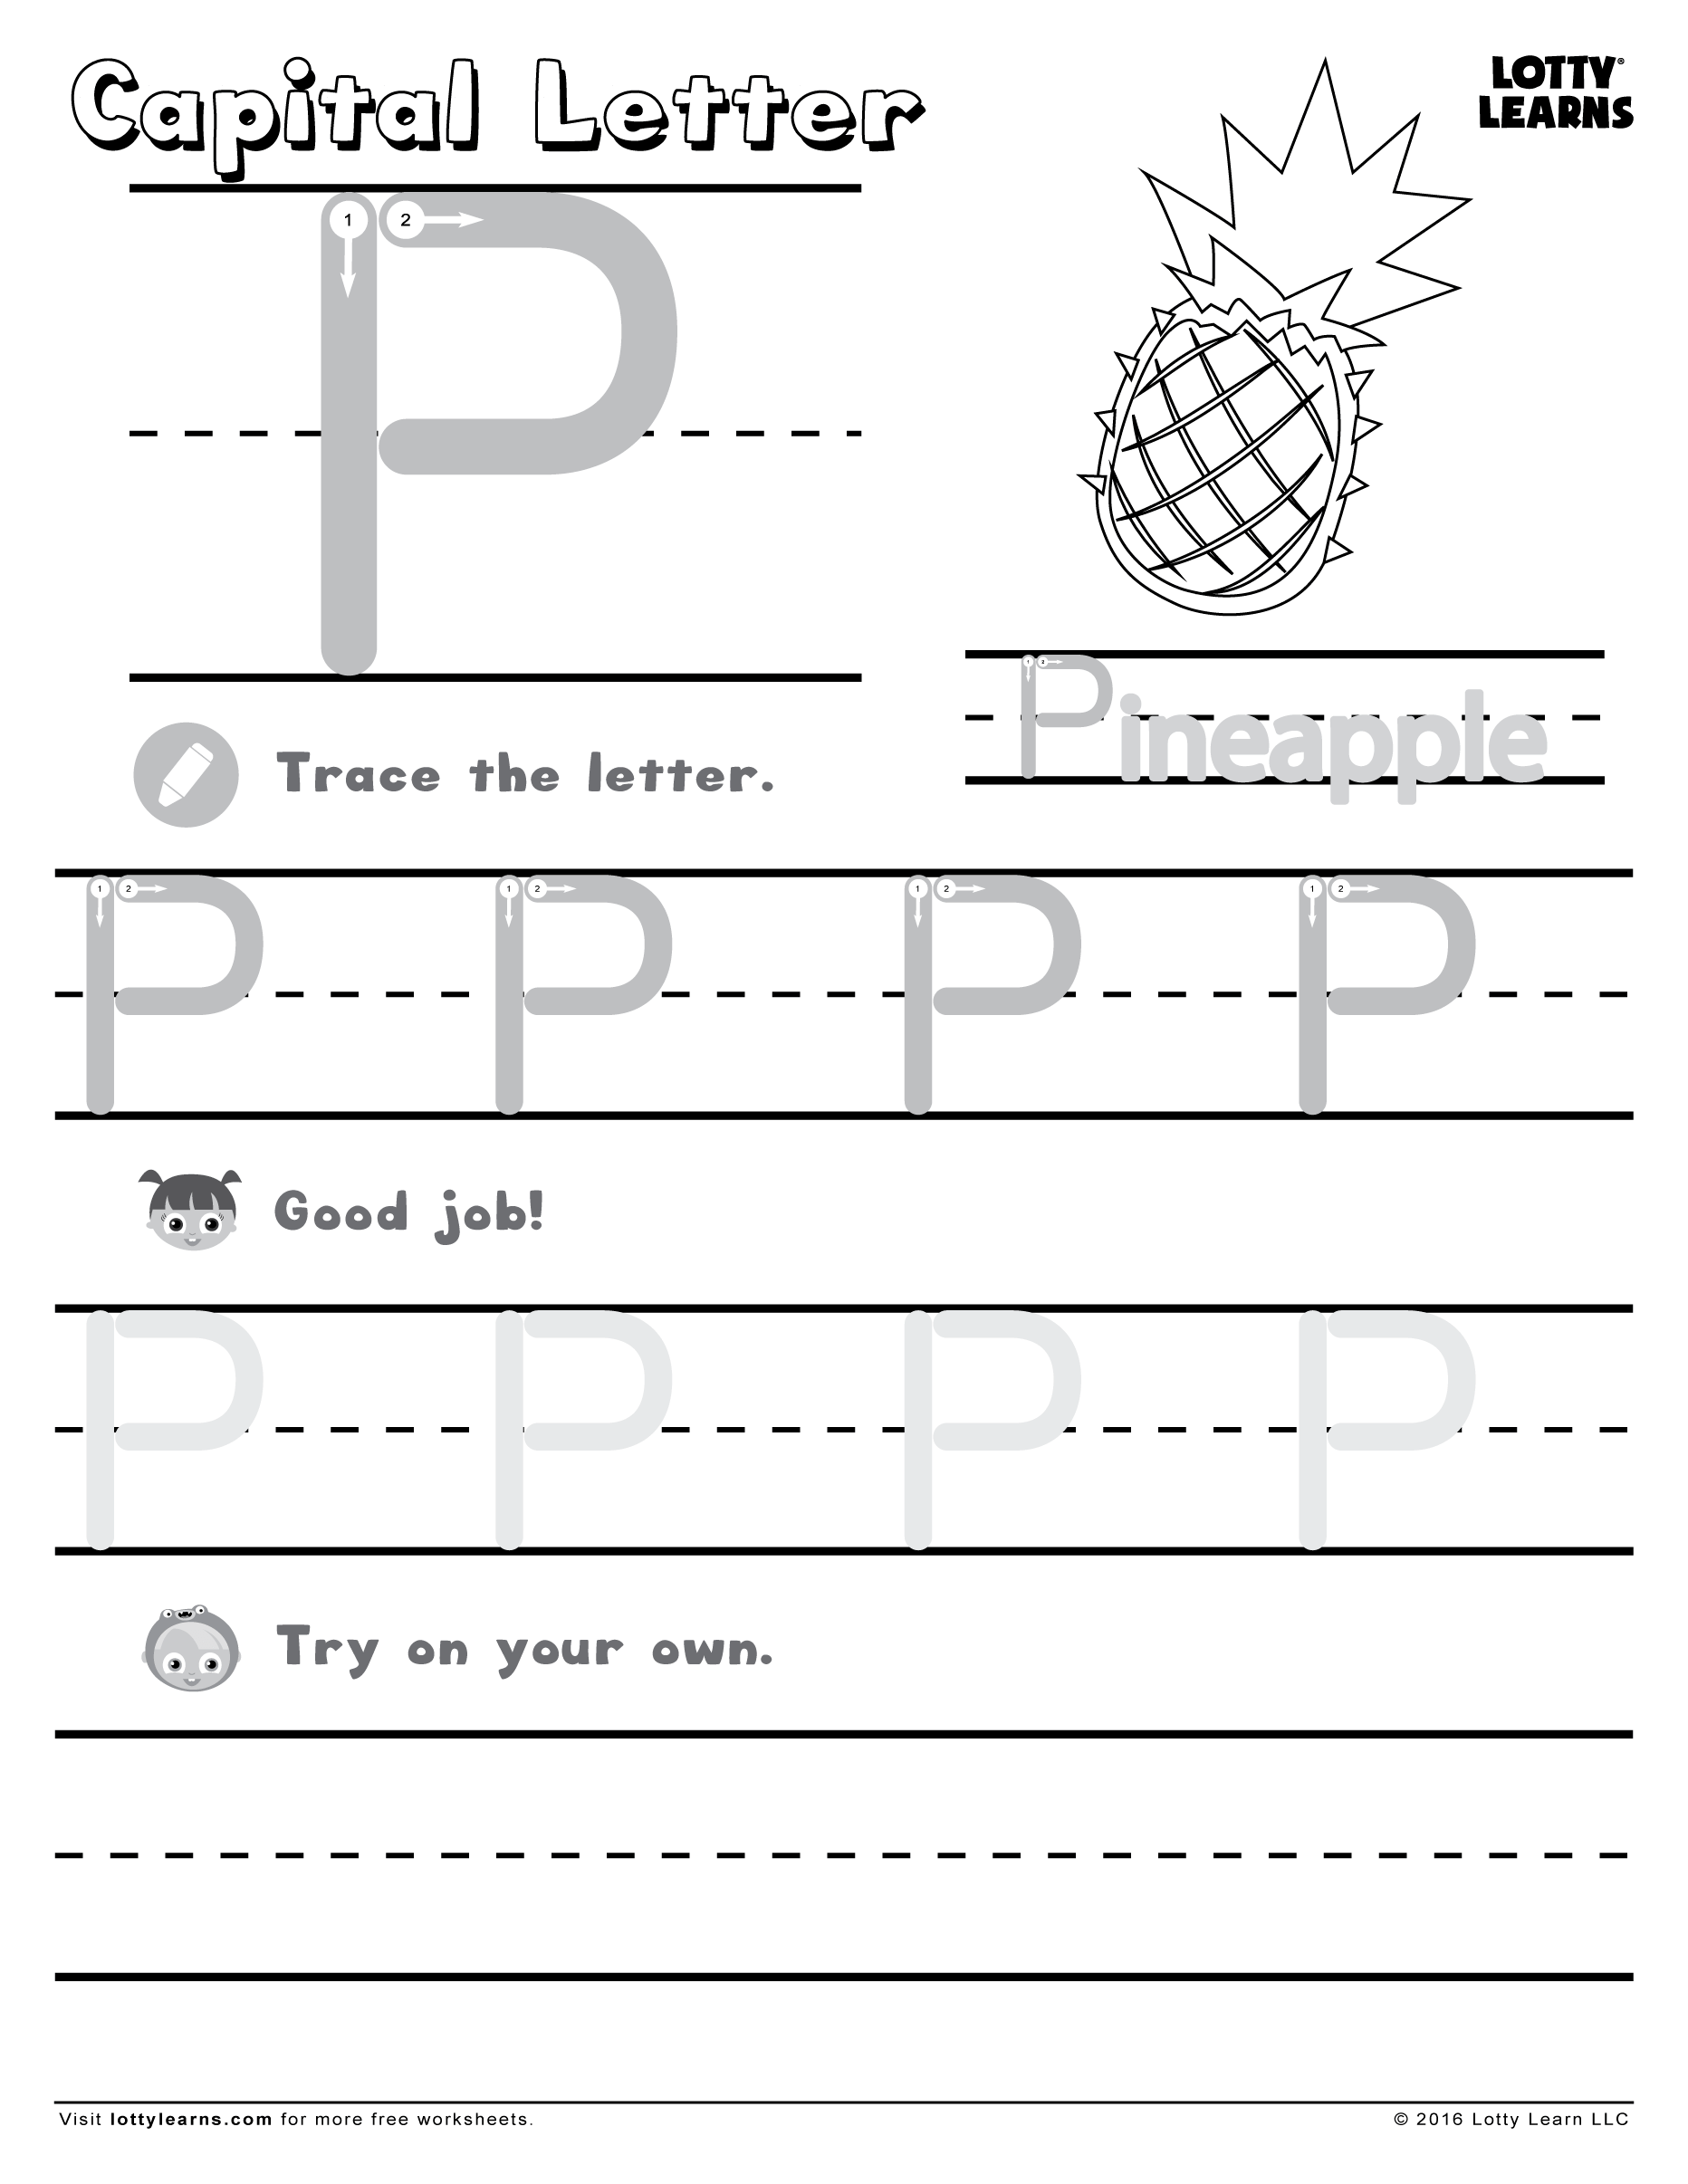 Capital Letter P